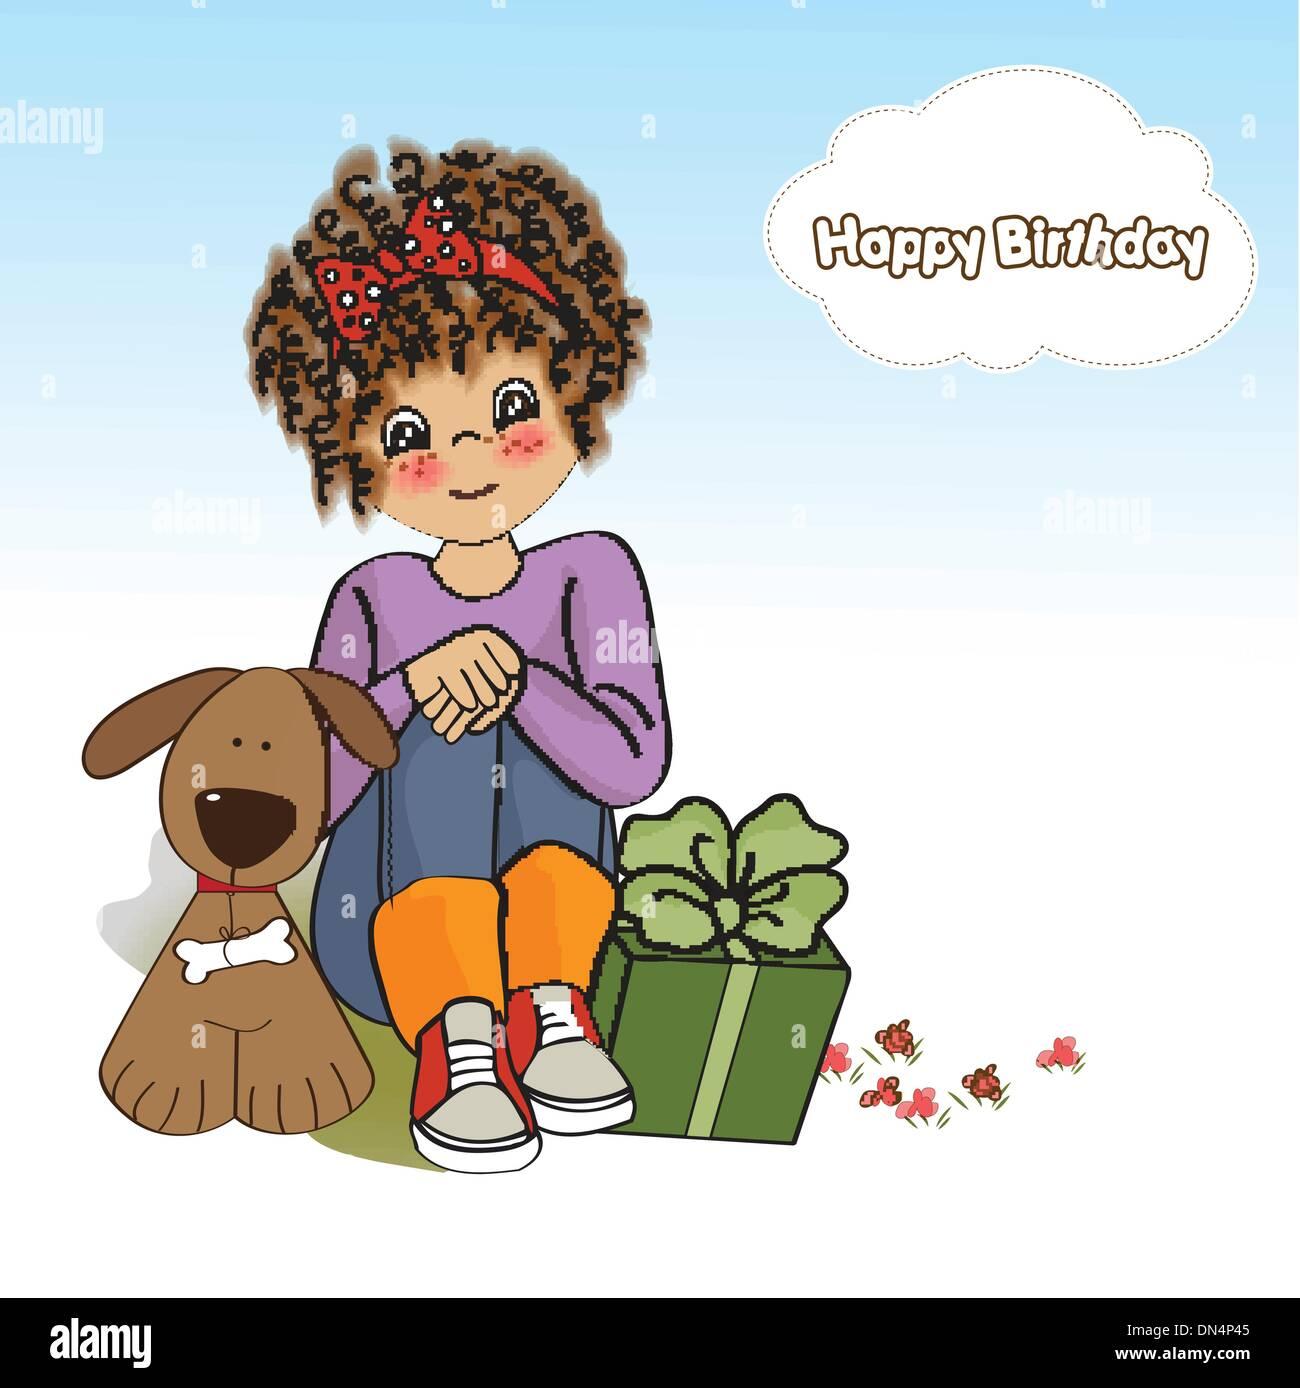 Fabulous Birthday Greeting Card With Pretty Little Girl Stock Vector Art Funny Birthday Cards Online Ioscodamsfinfo